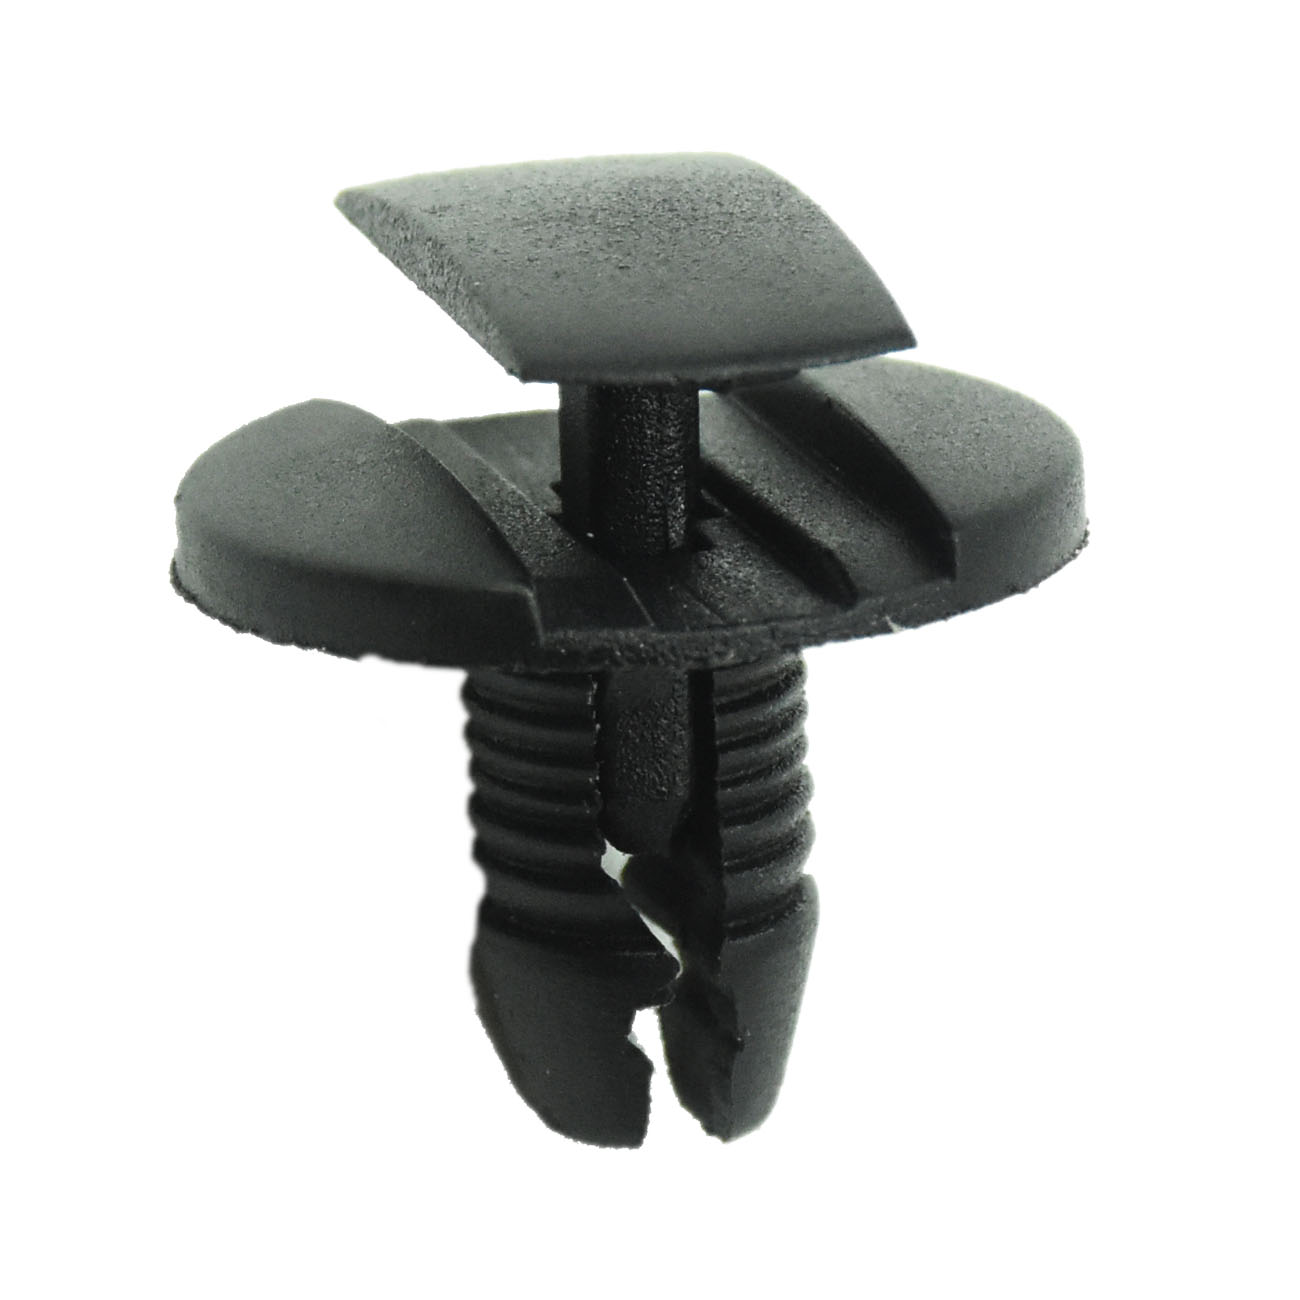 10Pcs PEUGEOT BODY /& DOOR TRIM PANEL FASTENER SELF-LOCKING RIVET CLIPS